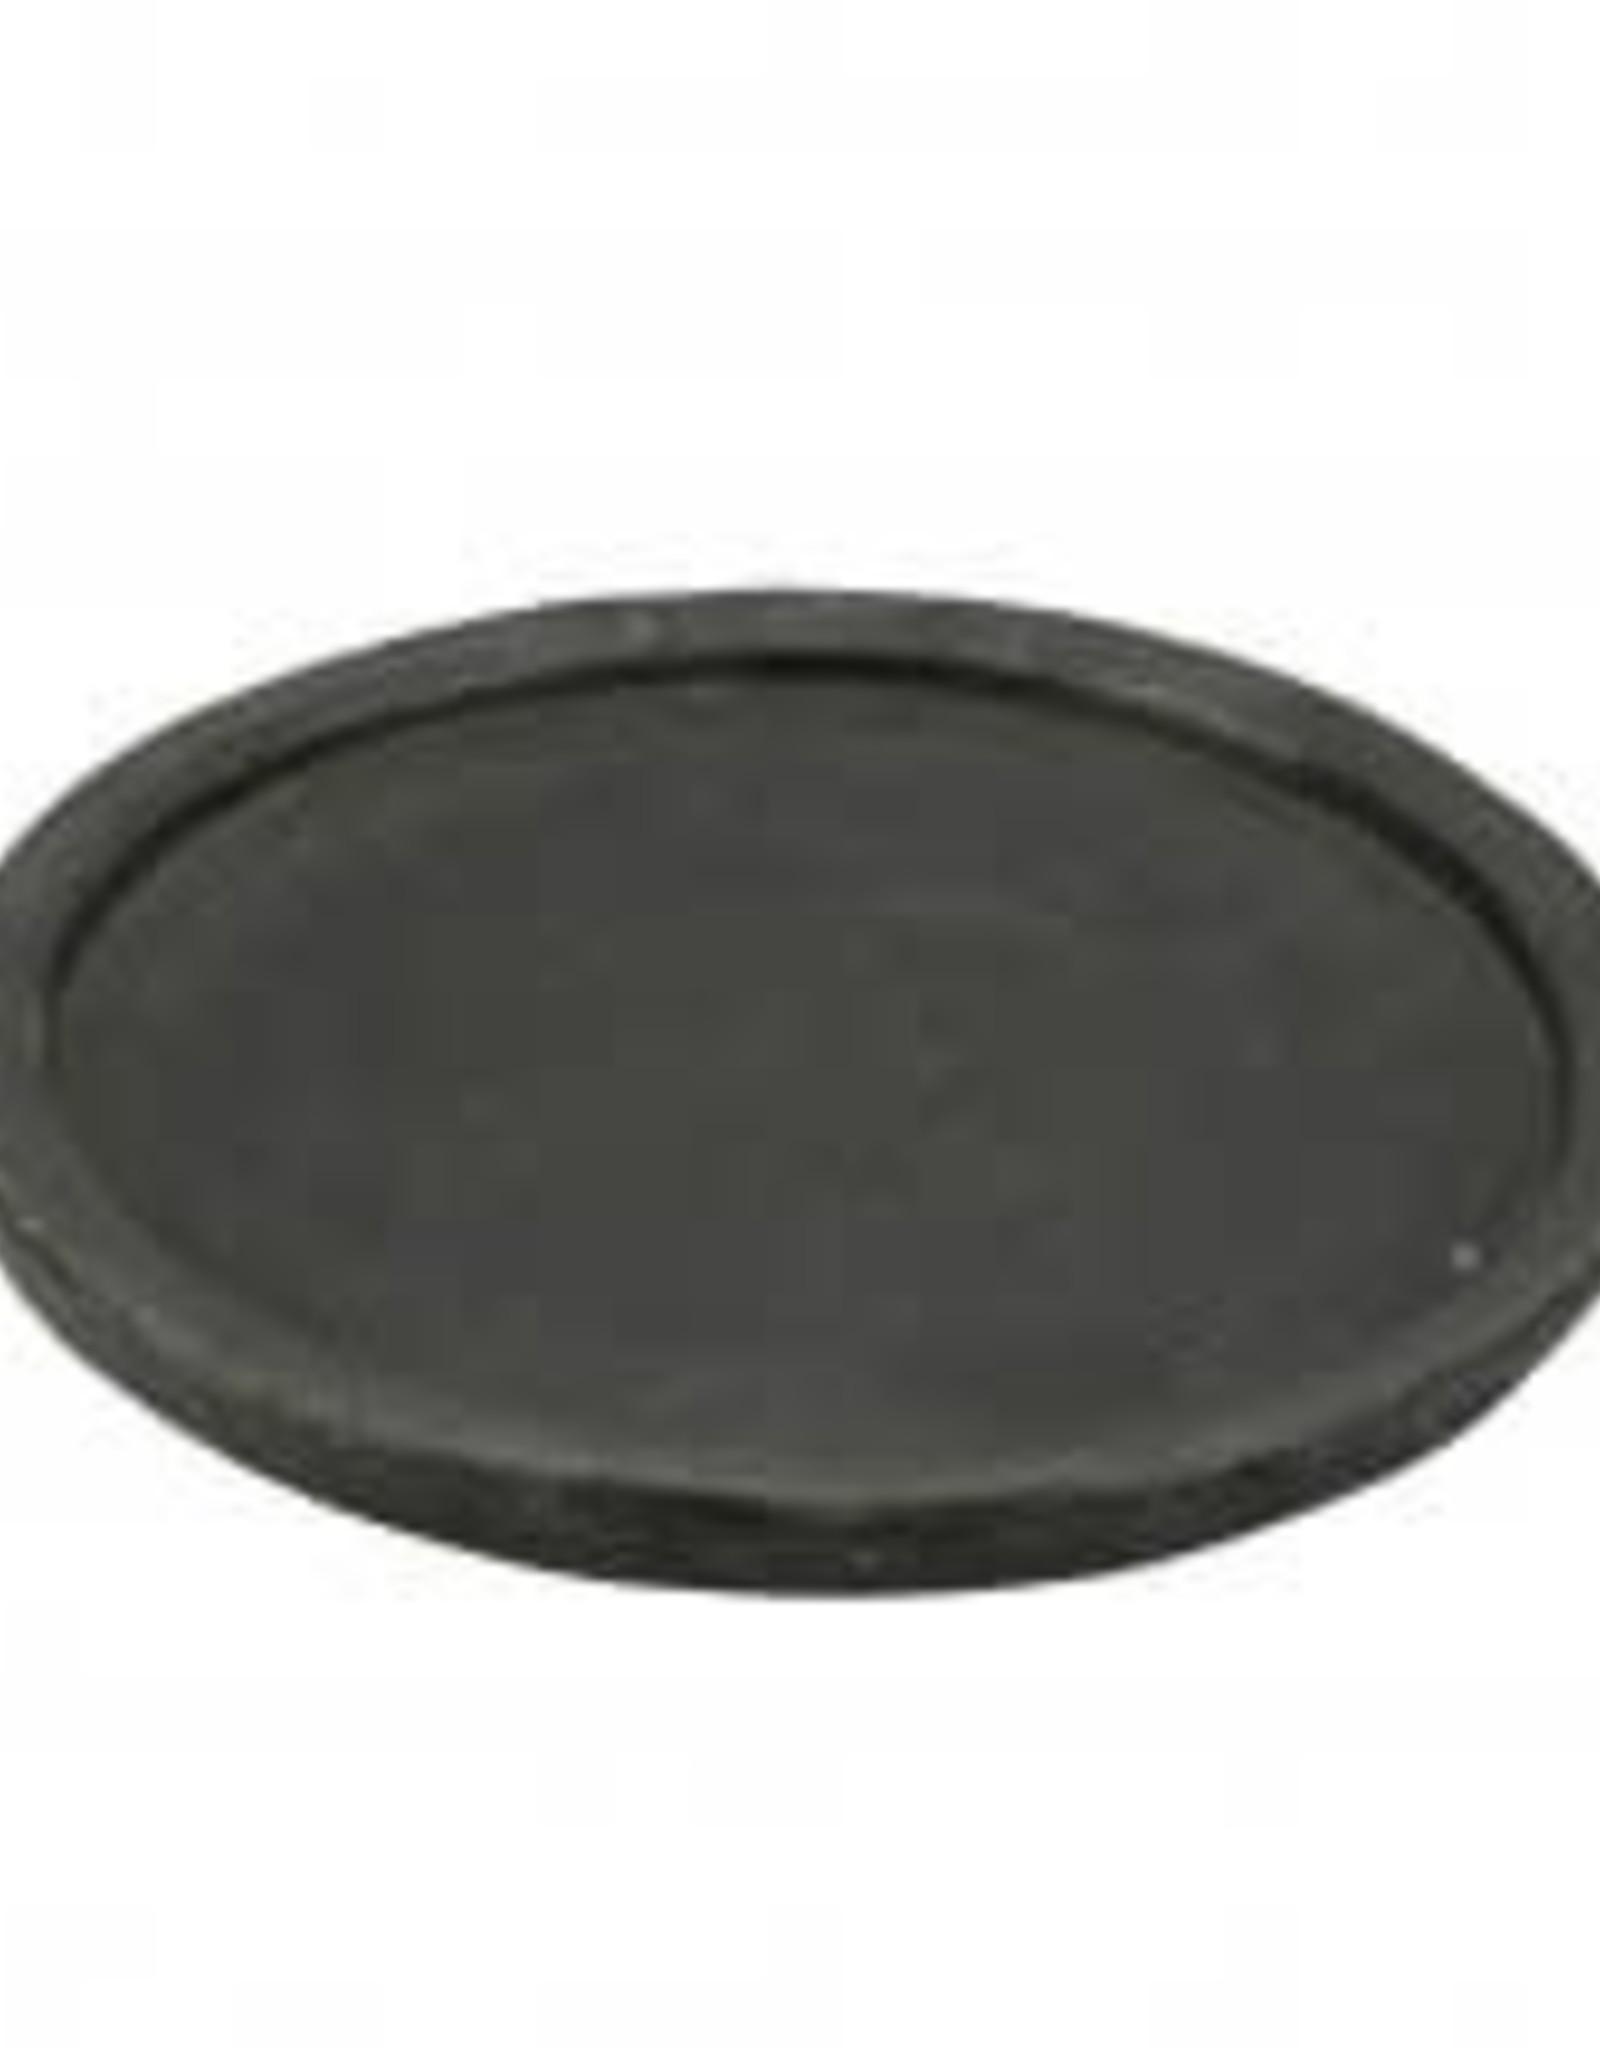 Black Stone Saucer